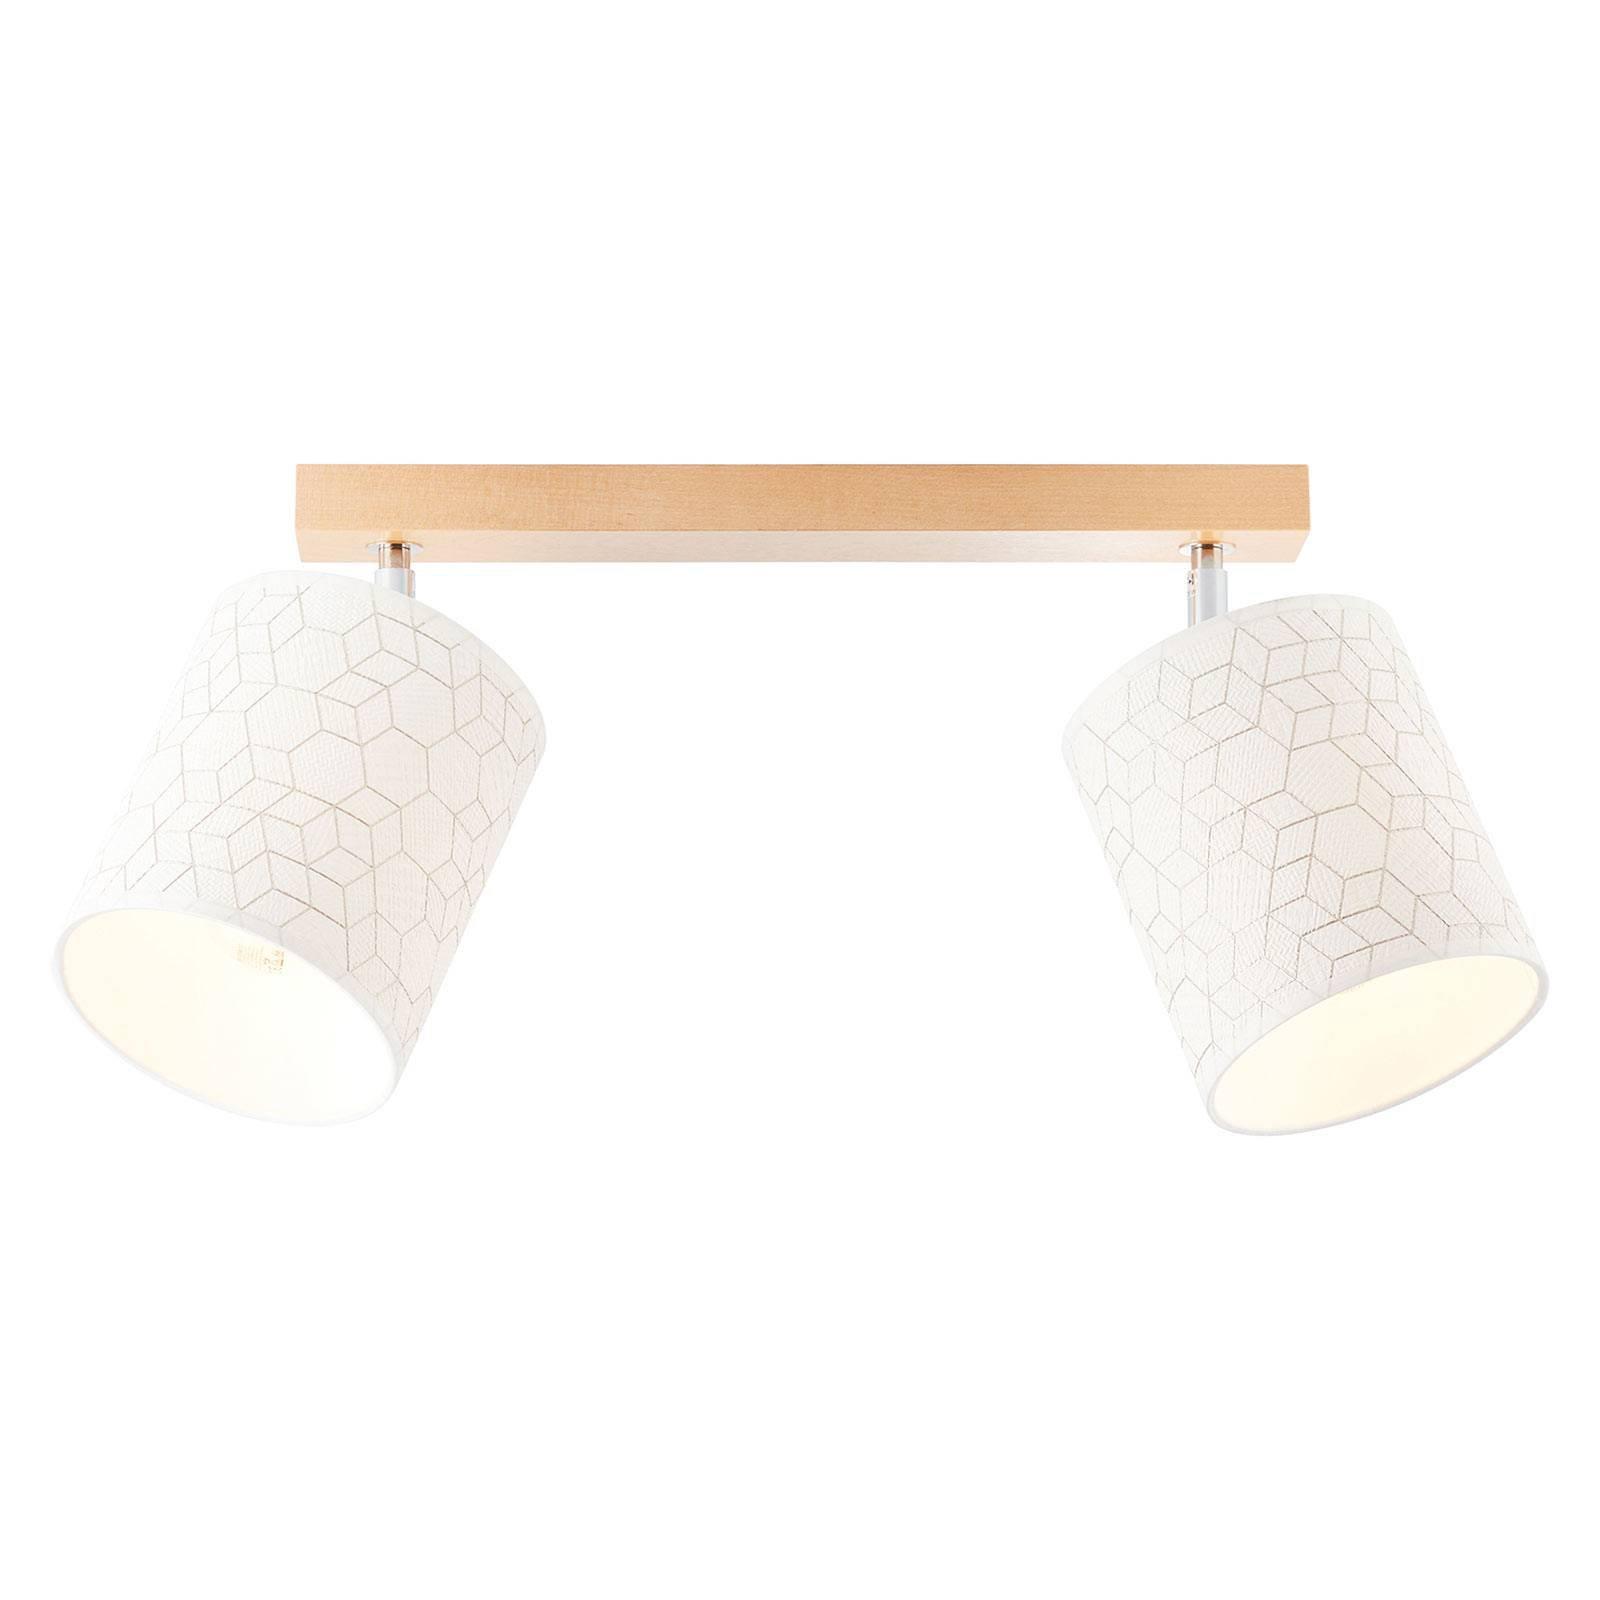 Taklampe Galance, hvit, 2 lyskilder